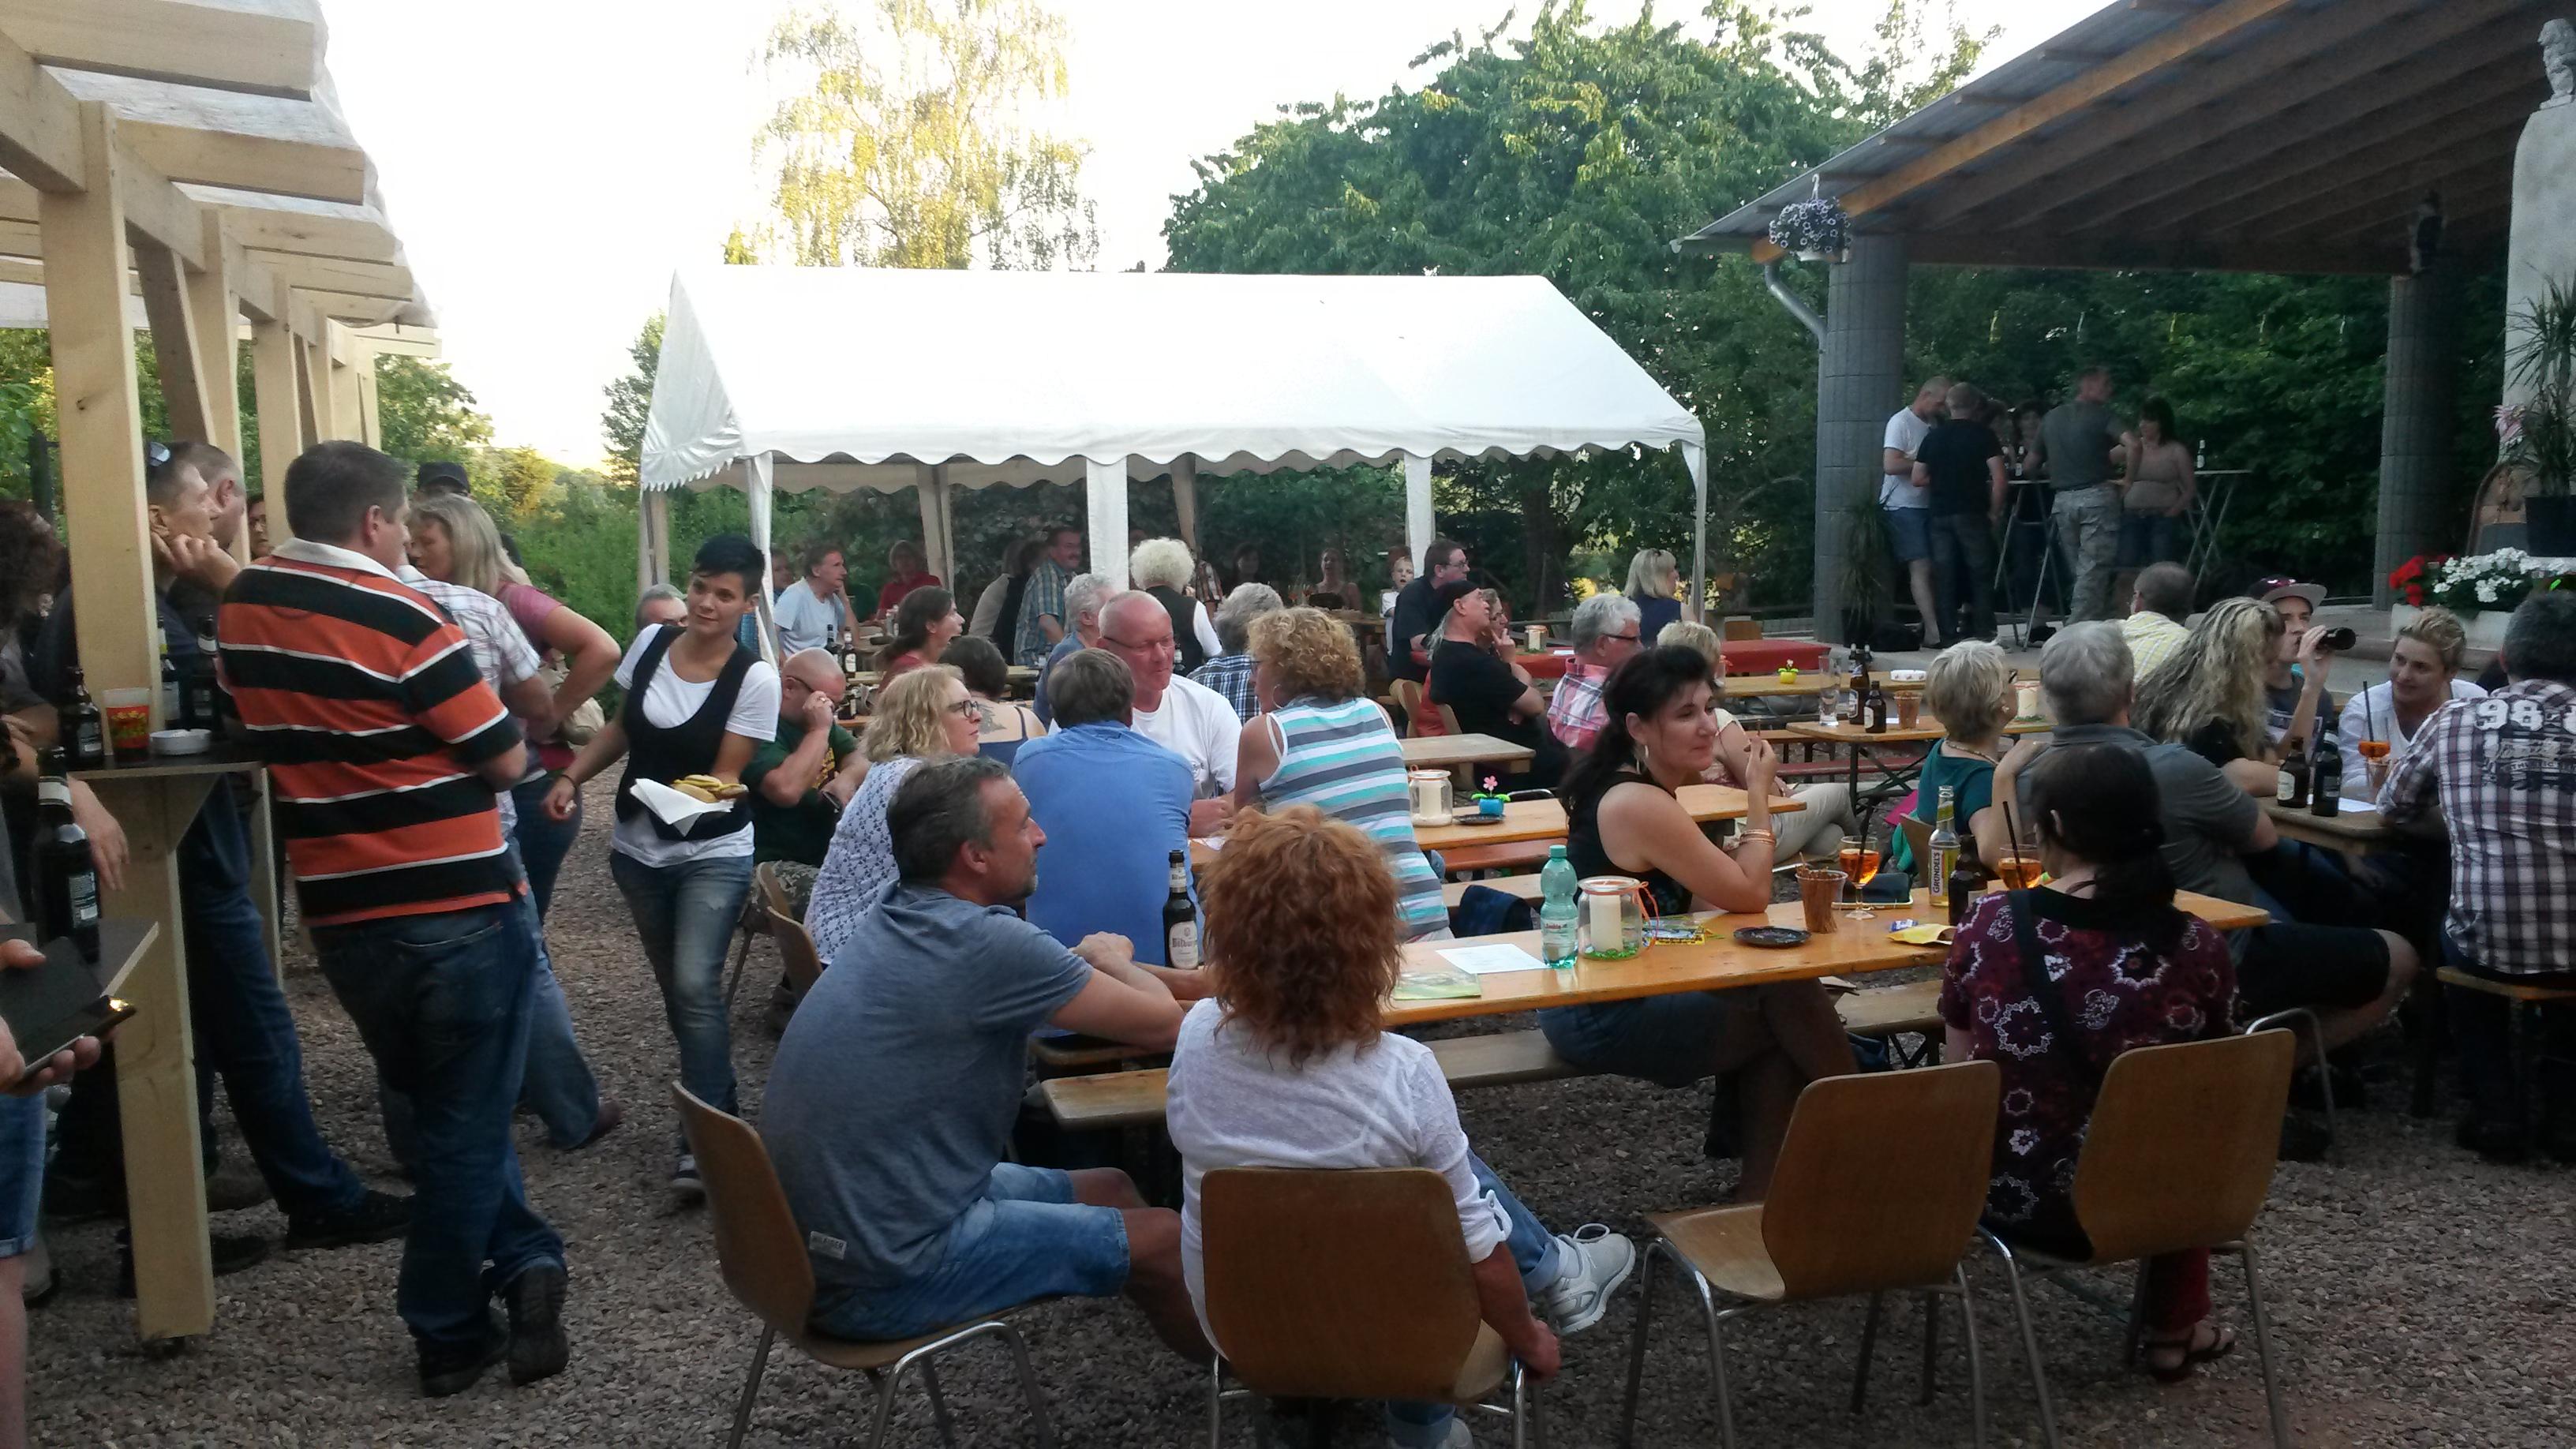 Wadern: Konzert in Herrys Kulturgarten Vogelsbüsch – Saarland